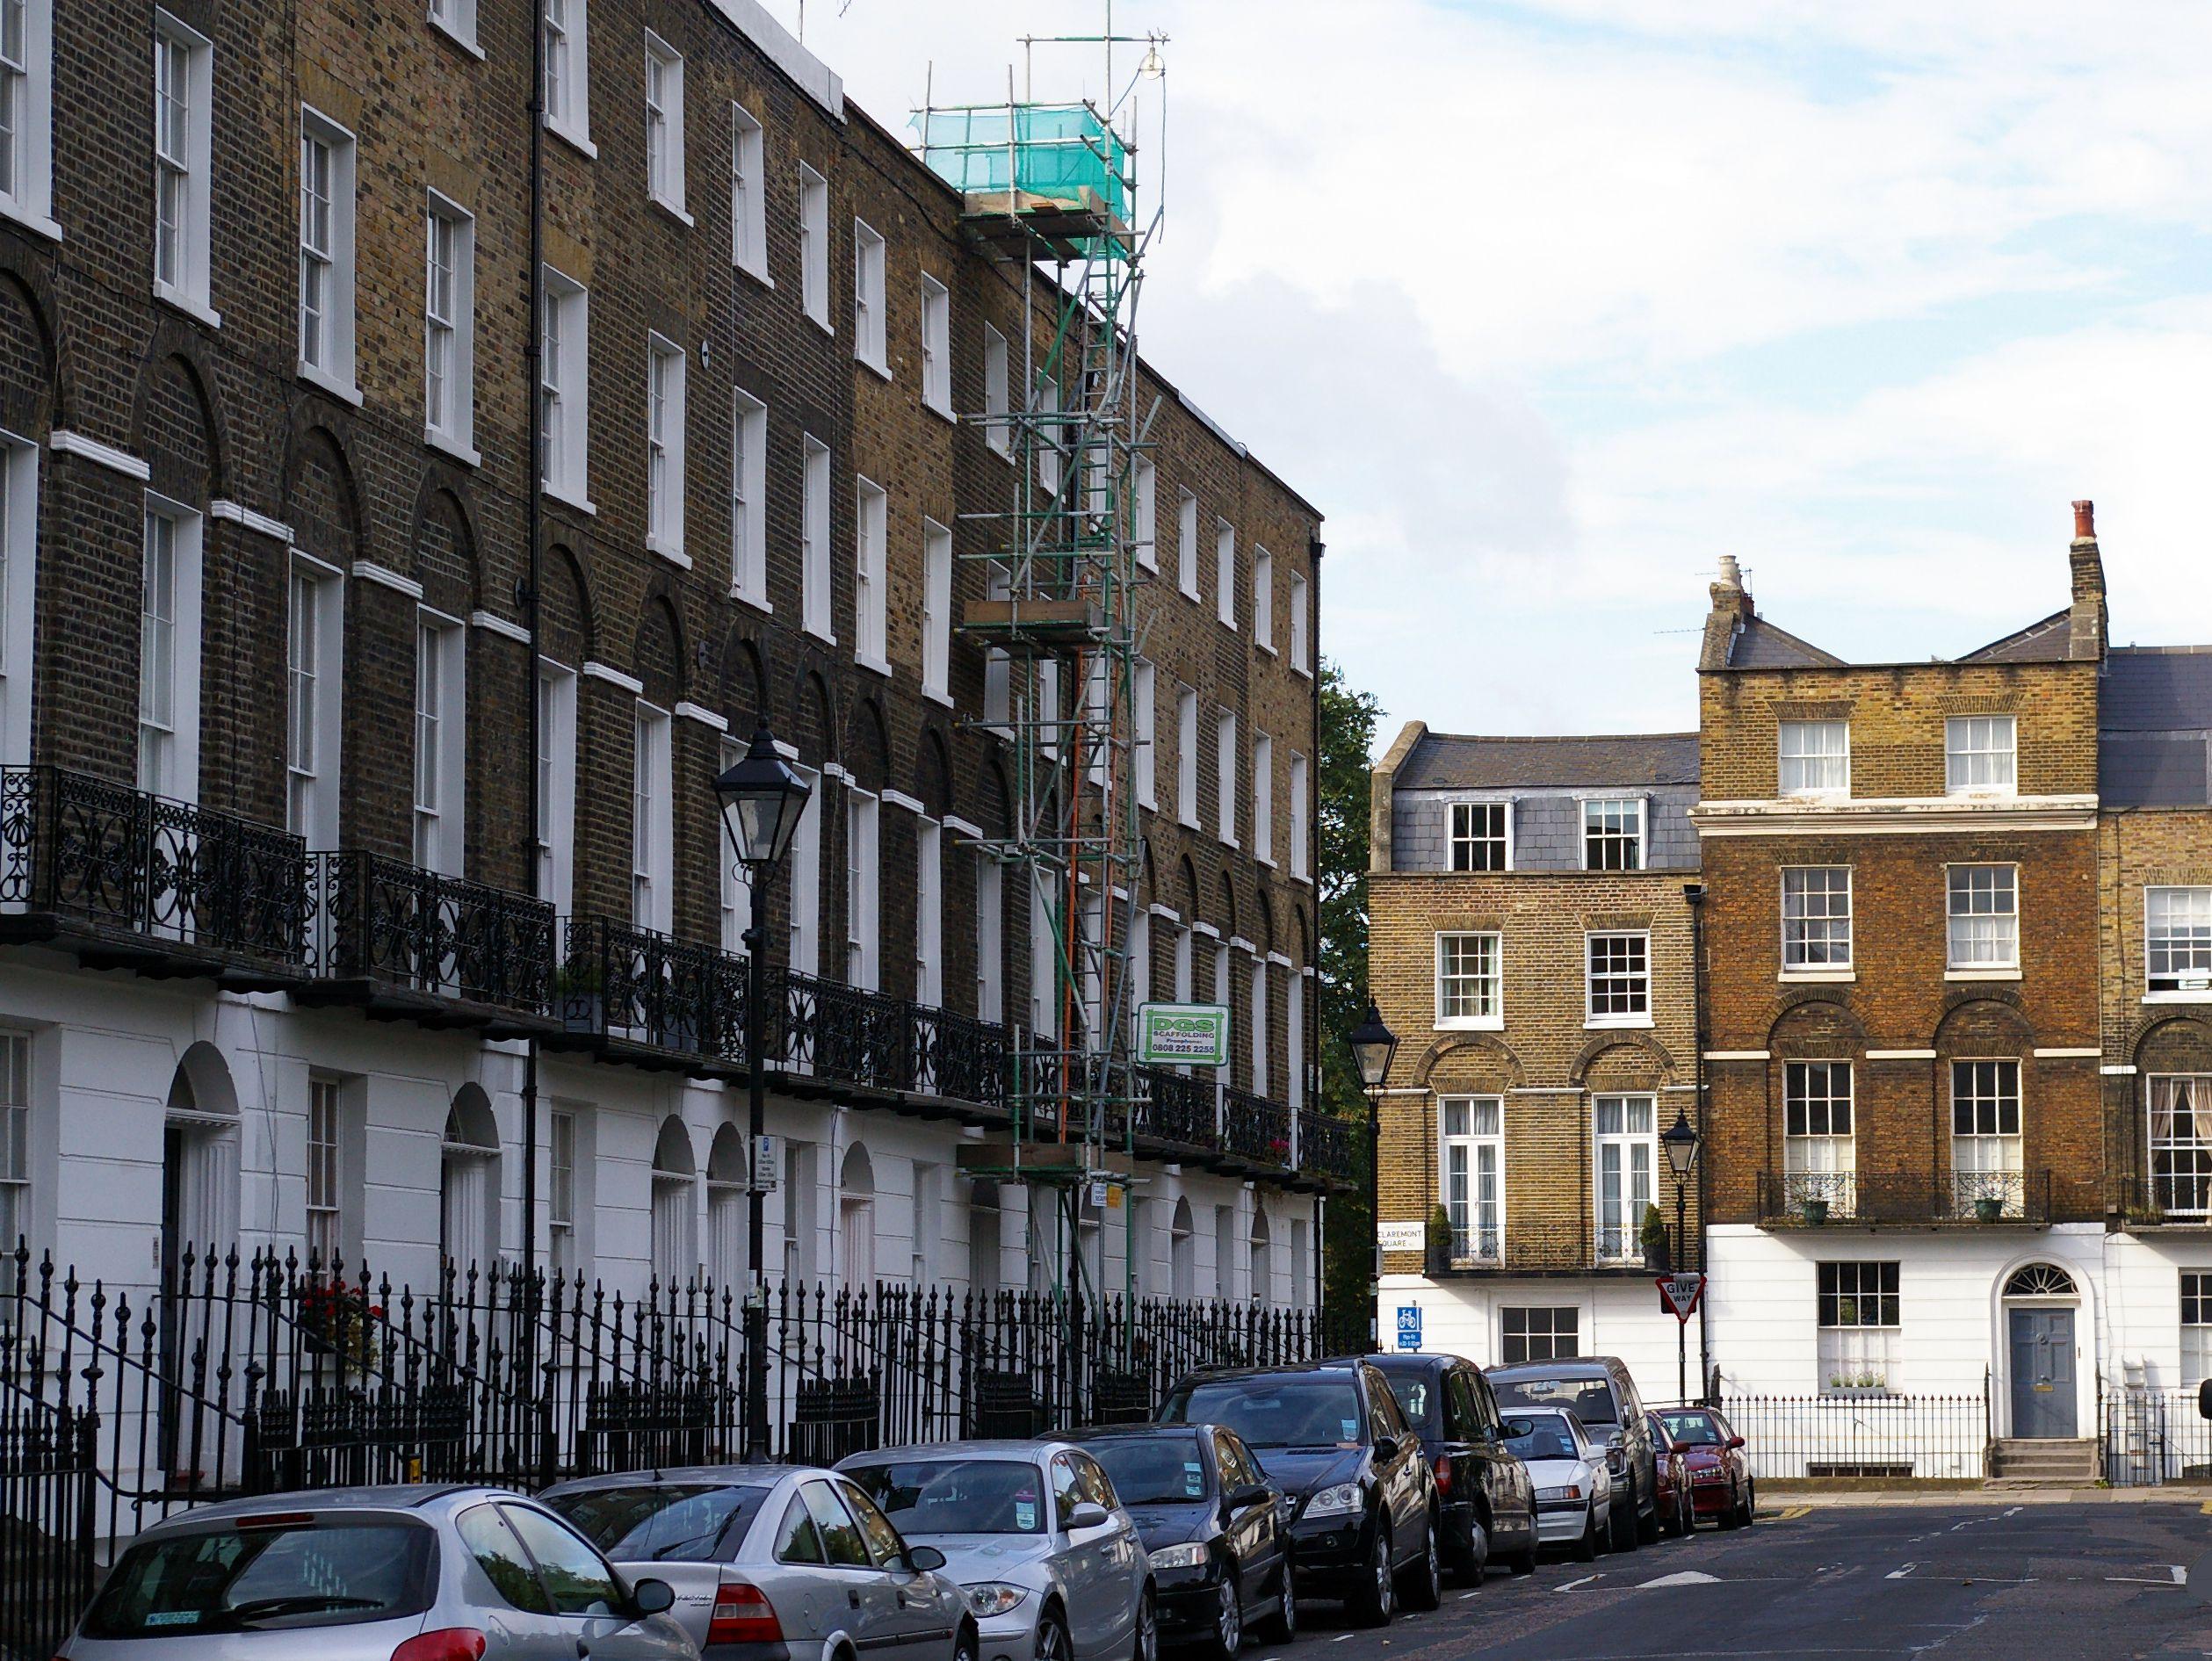 Grimmauld Place - Claremont Square, London N1